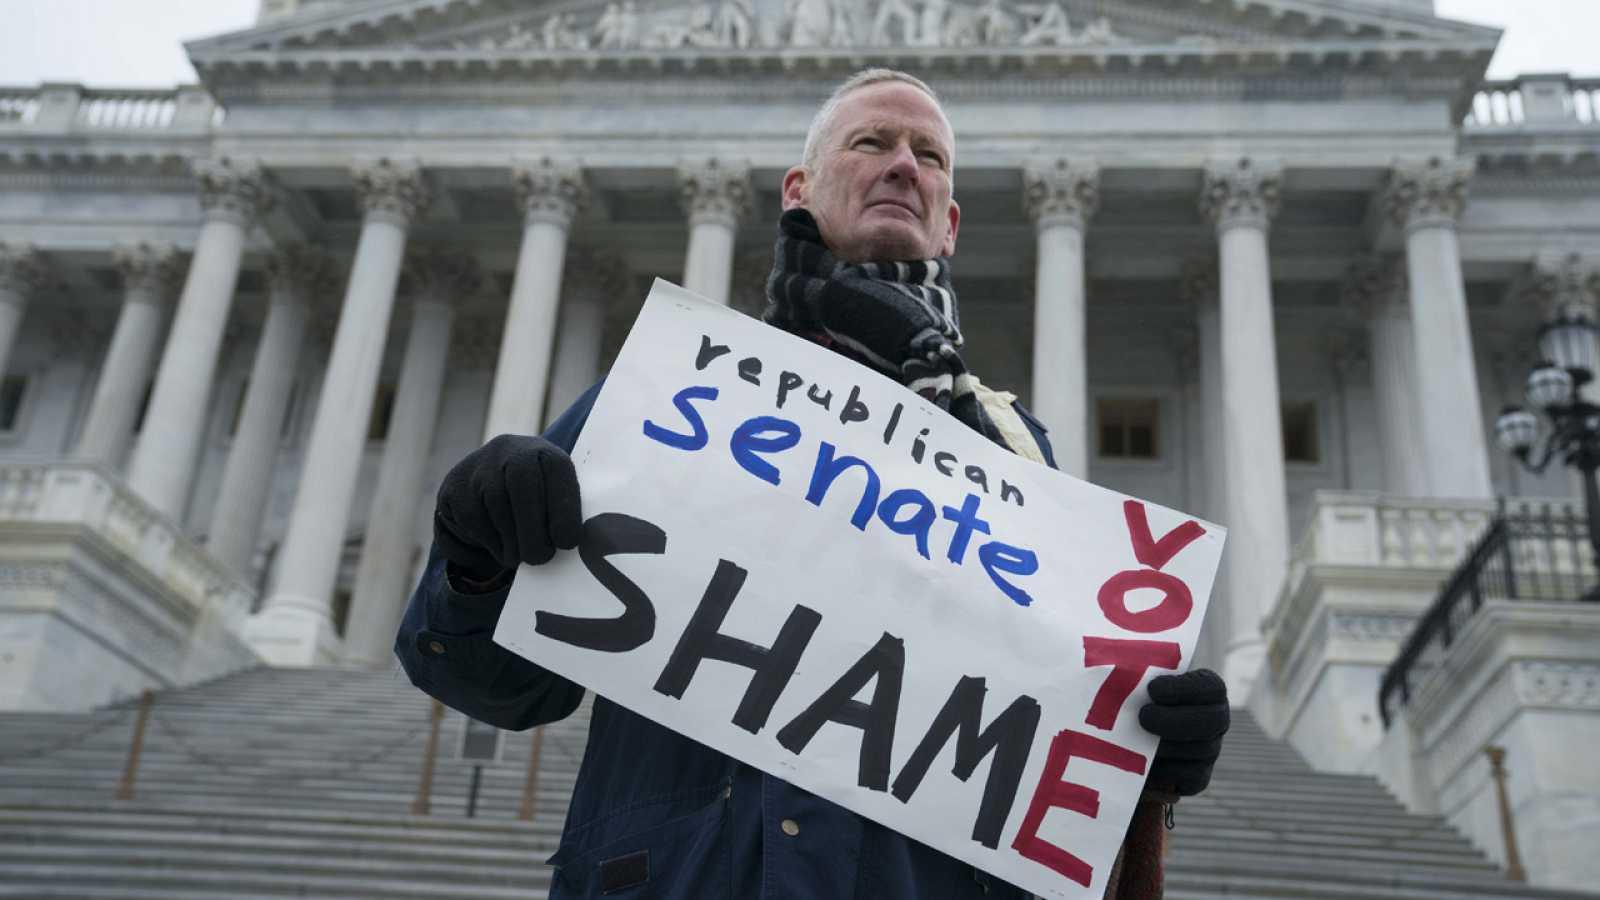 Un manifestante, este miércoles frente al Senado